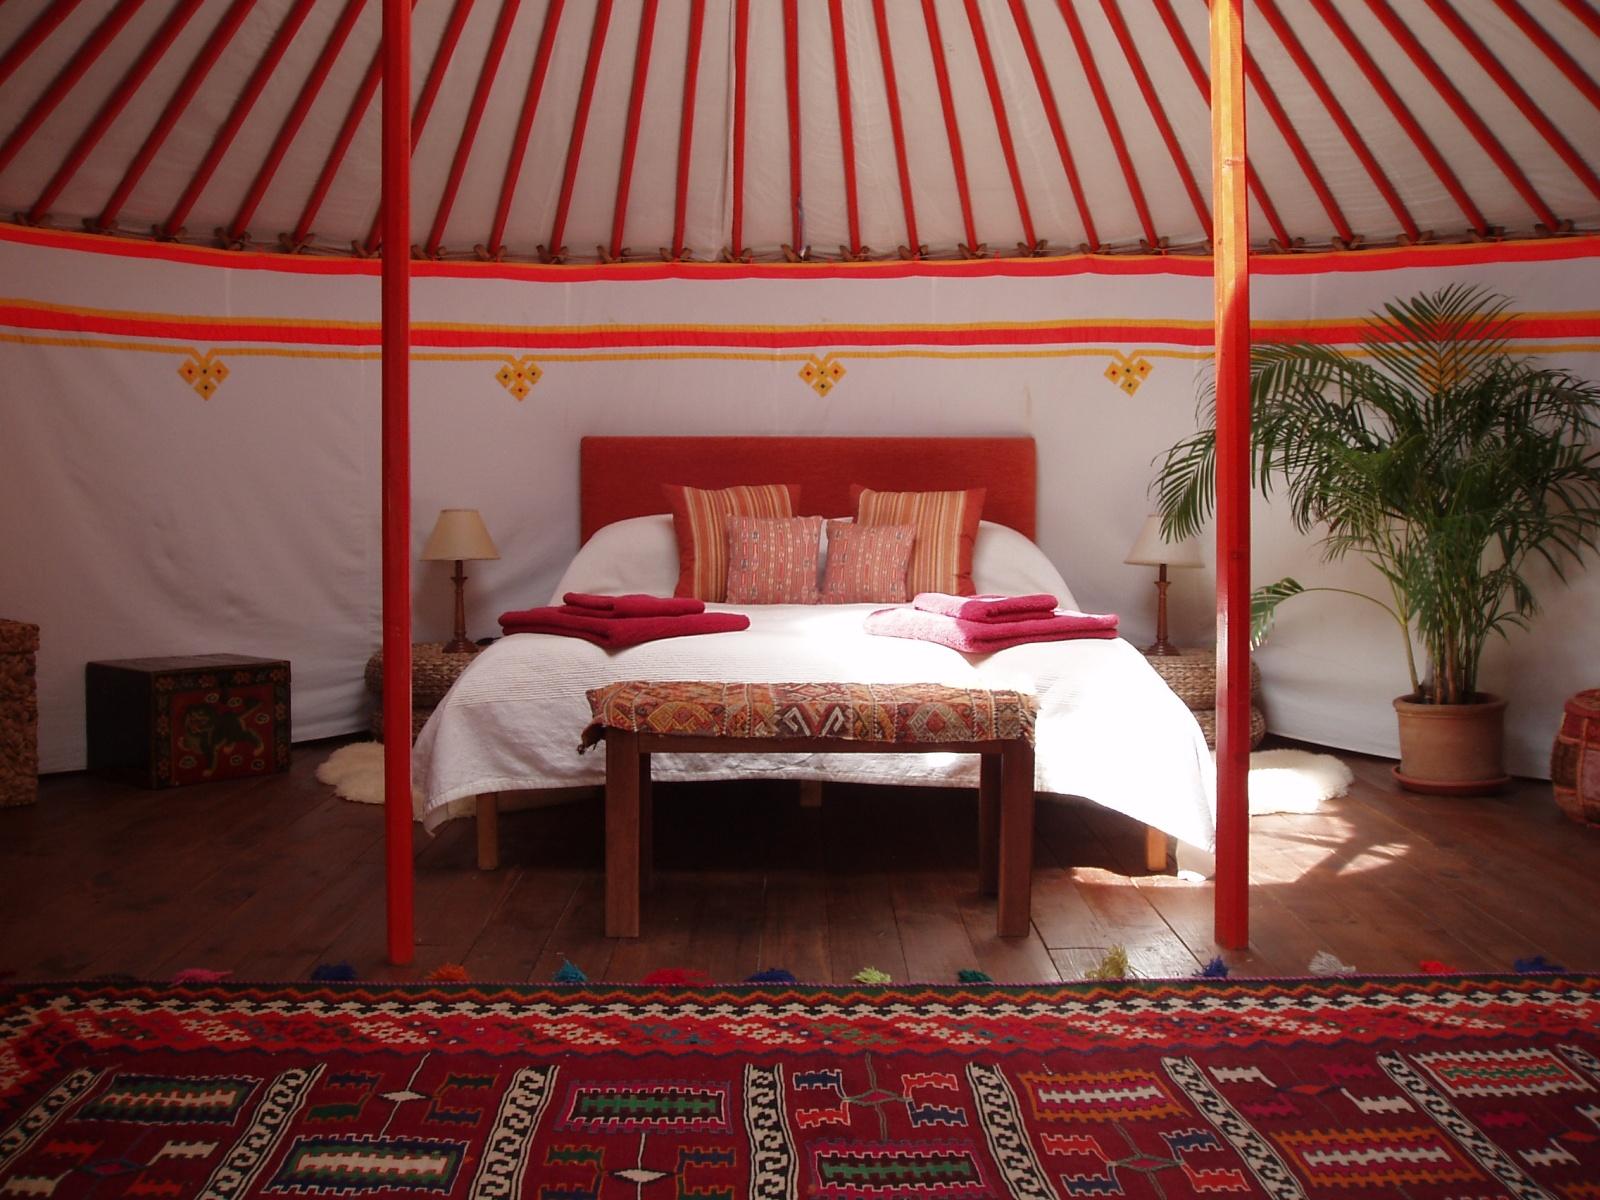 The Hoopoe Yurt Hotel Traditional Nomadic Living